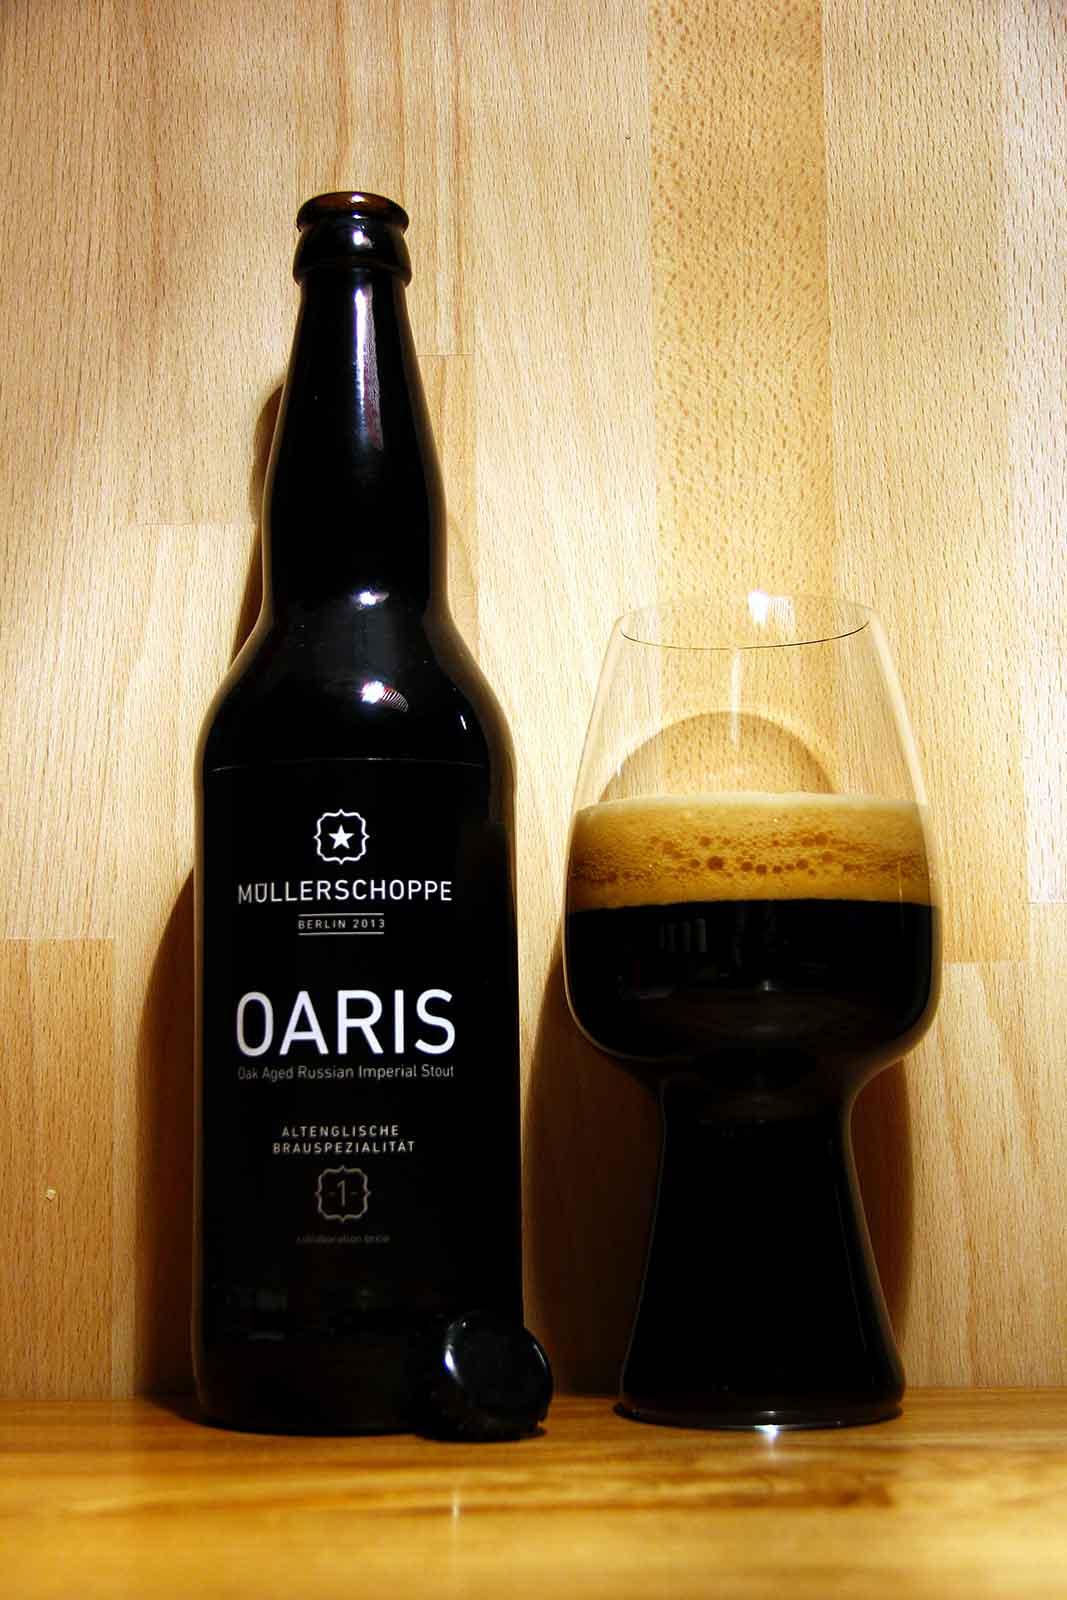 Tasting OARIS mit Spiegelau Stout Glas